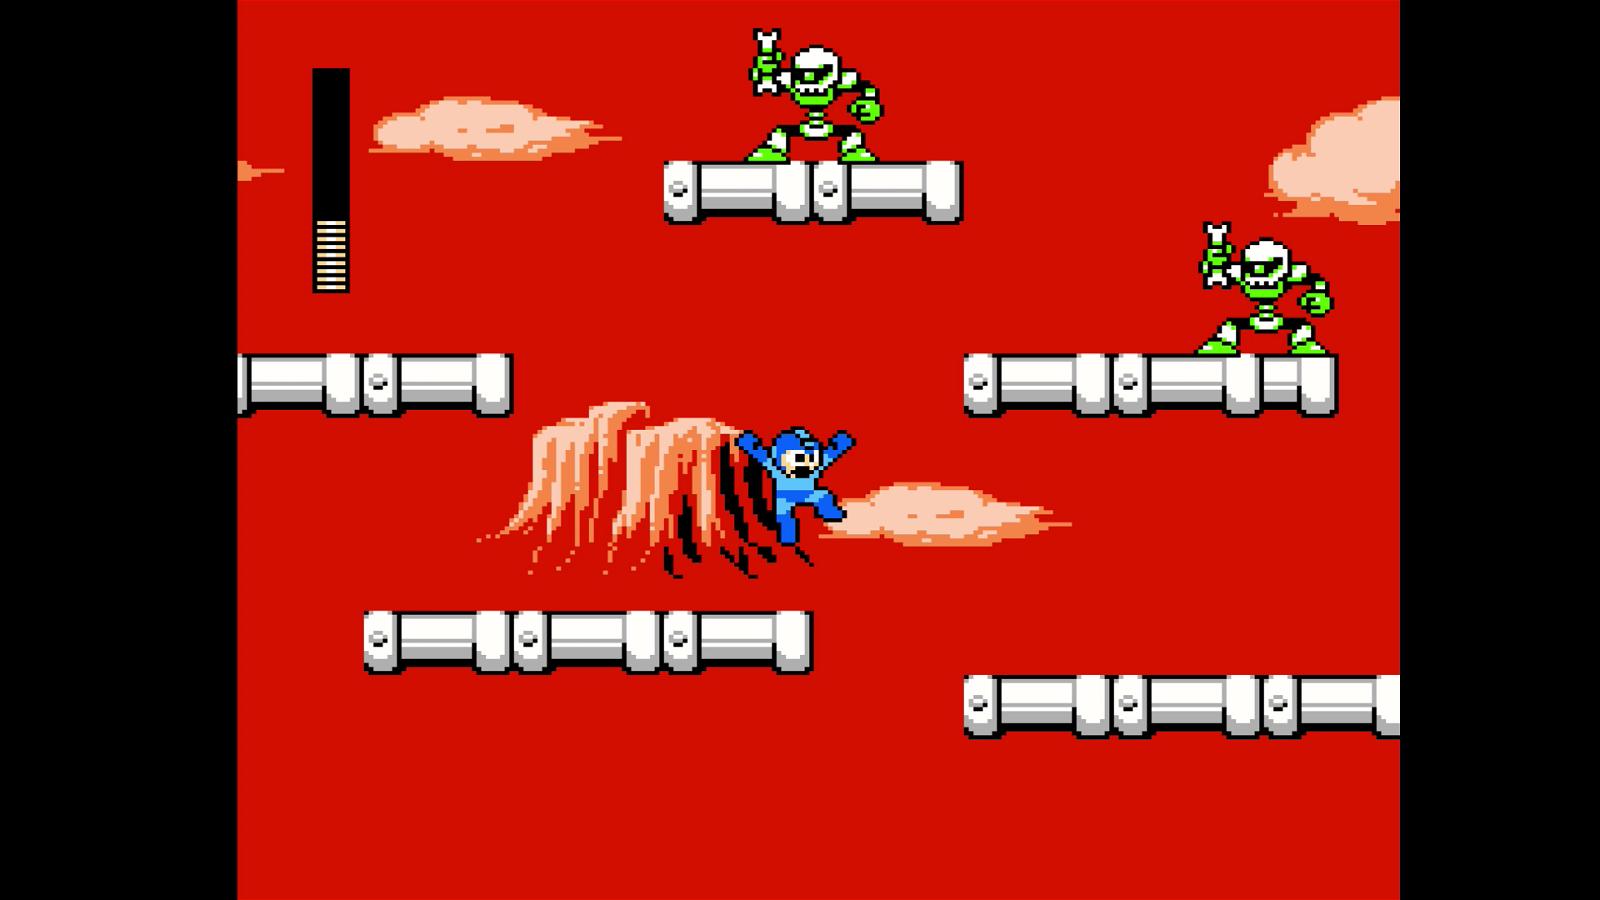 Capcom Announces Mega Man Legacy Collection And Confirms E3 Lineup - 2015-06-08 11:13:35